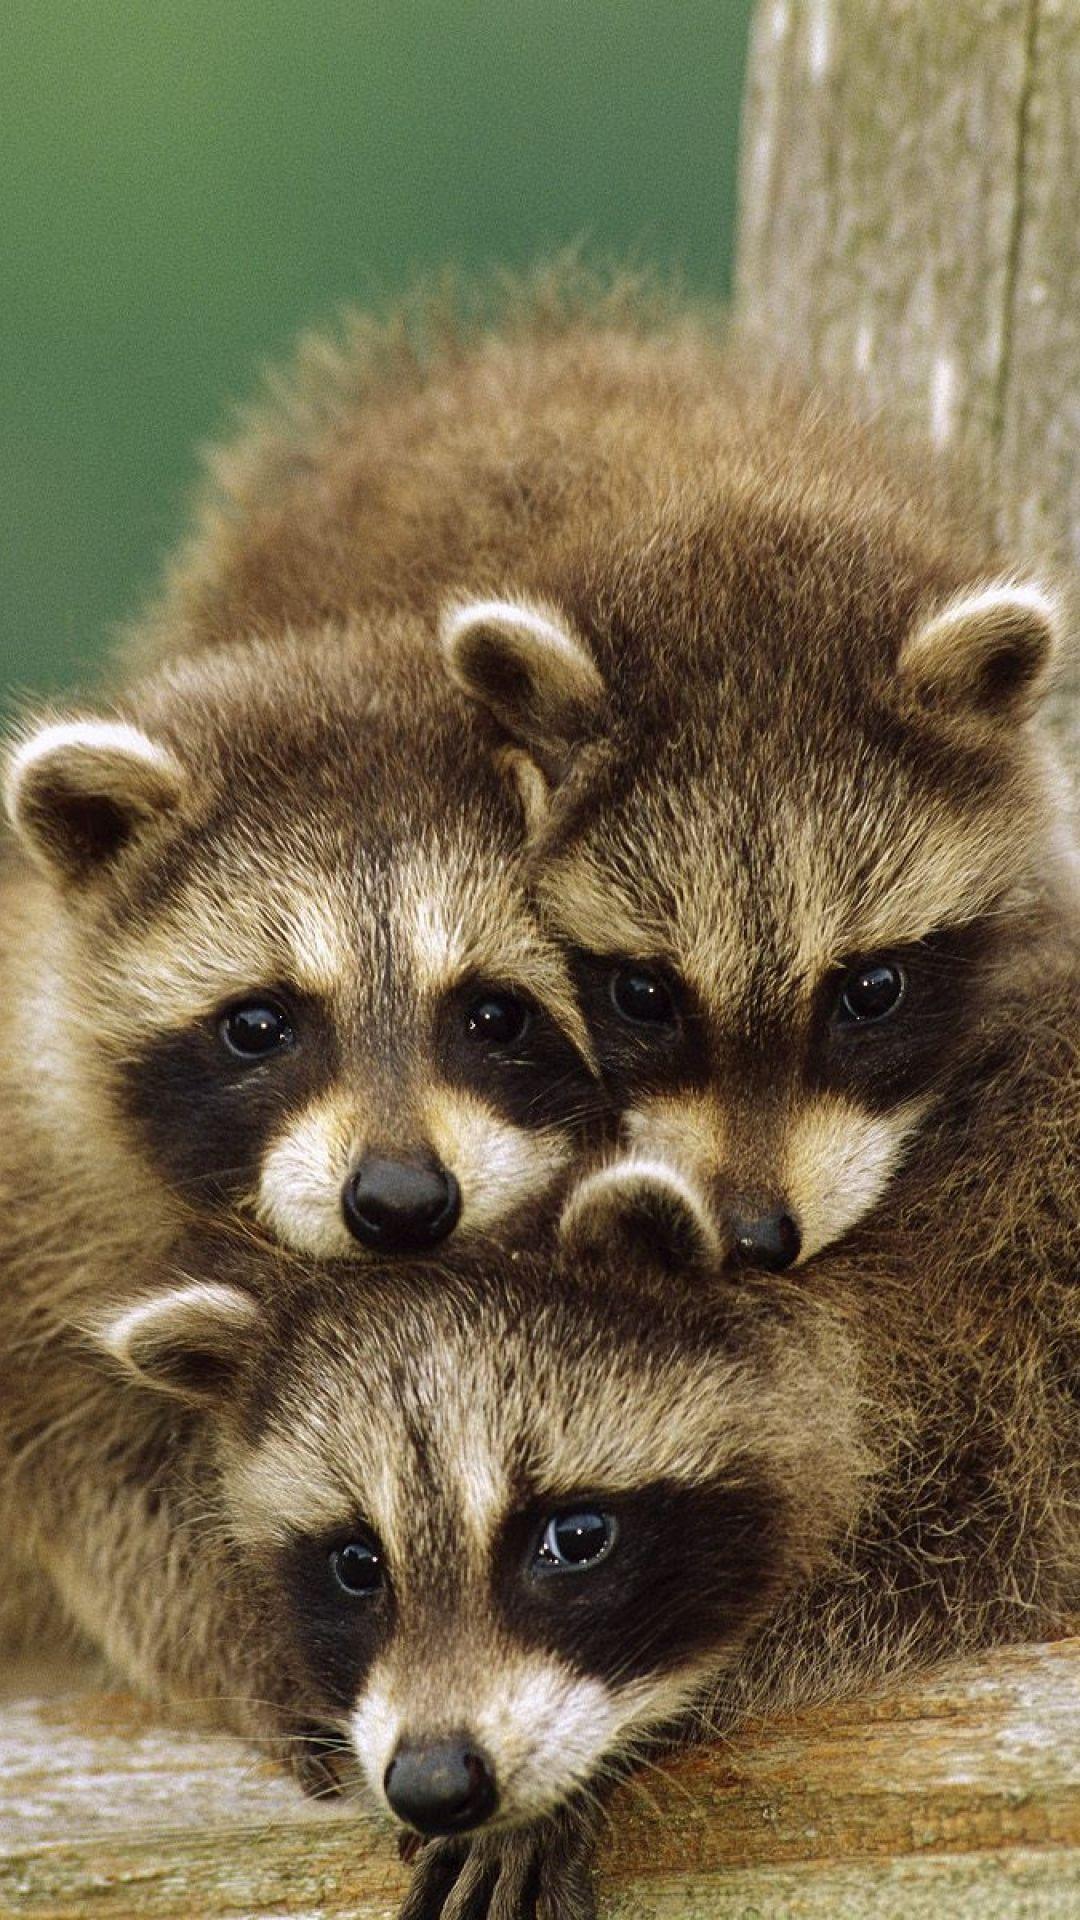 adorable baby raccoons | Cuteness | Pinterest | Baby raccoon ...